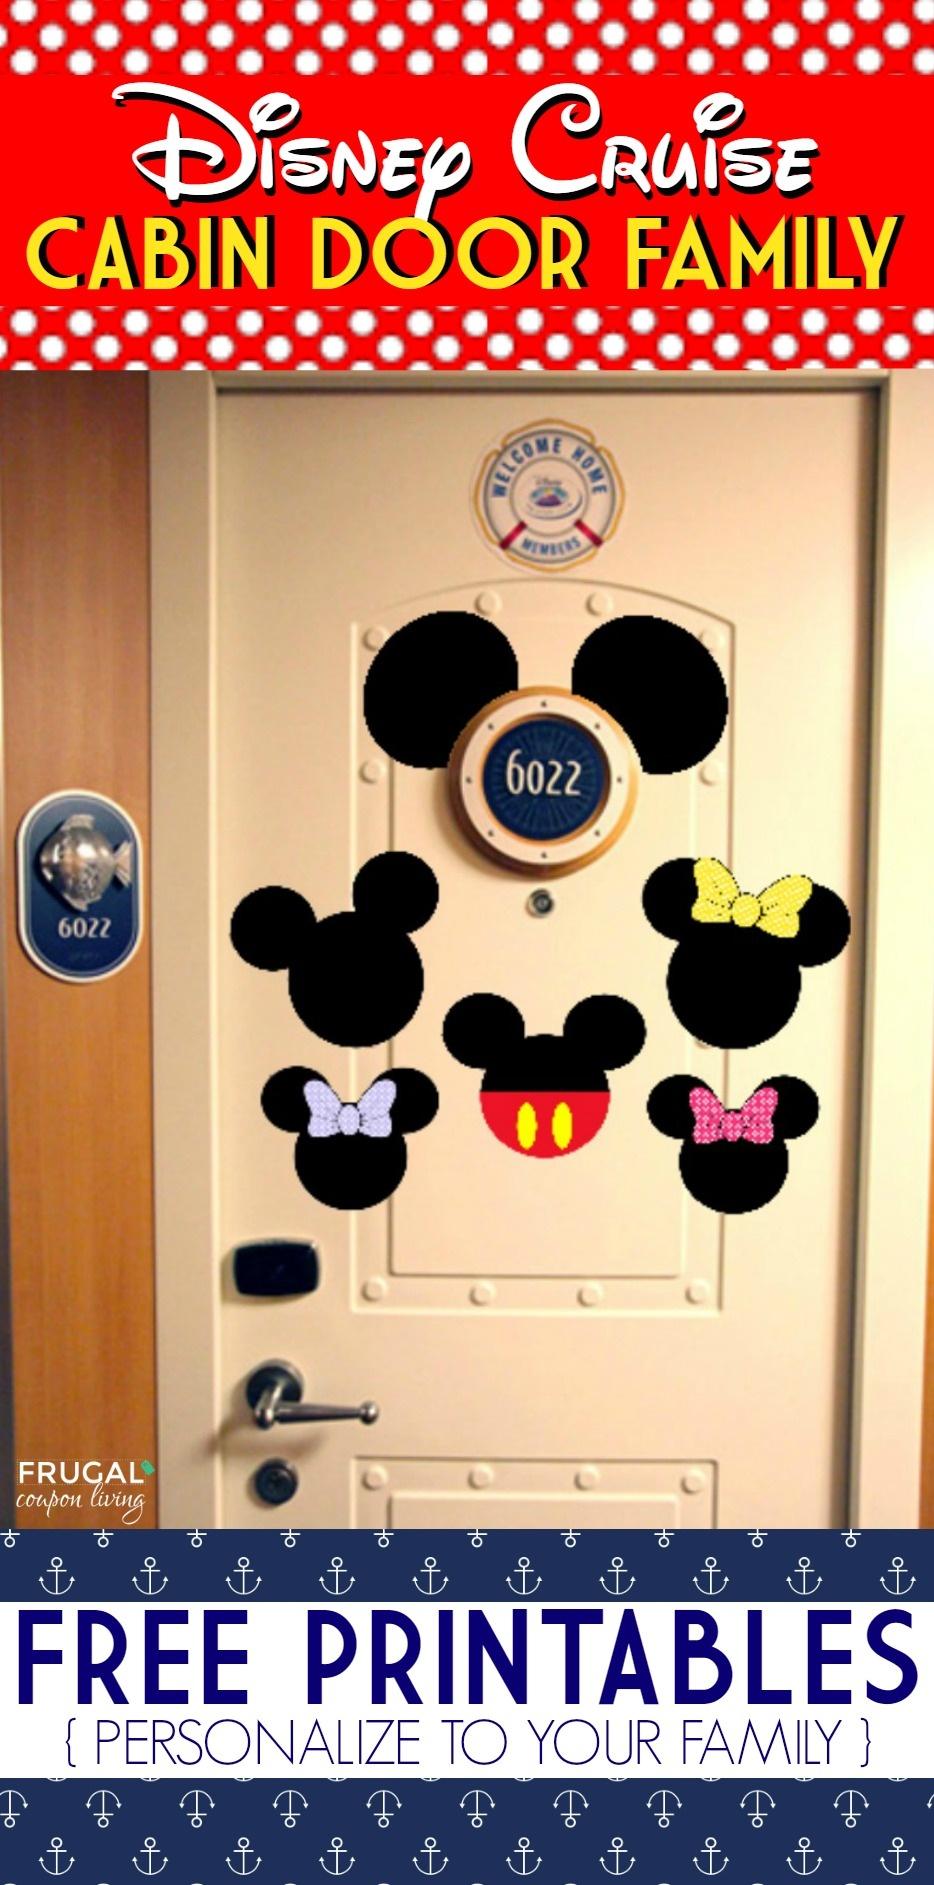 20 Free Disney Printables - Crafts, Coloring, Creativity - Free Disney Printables